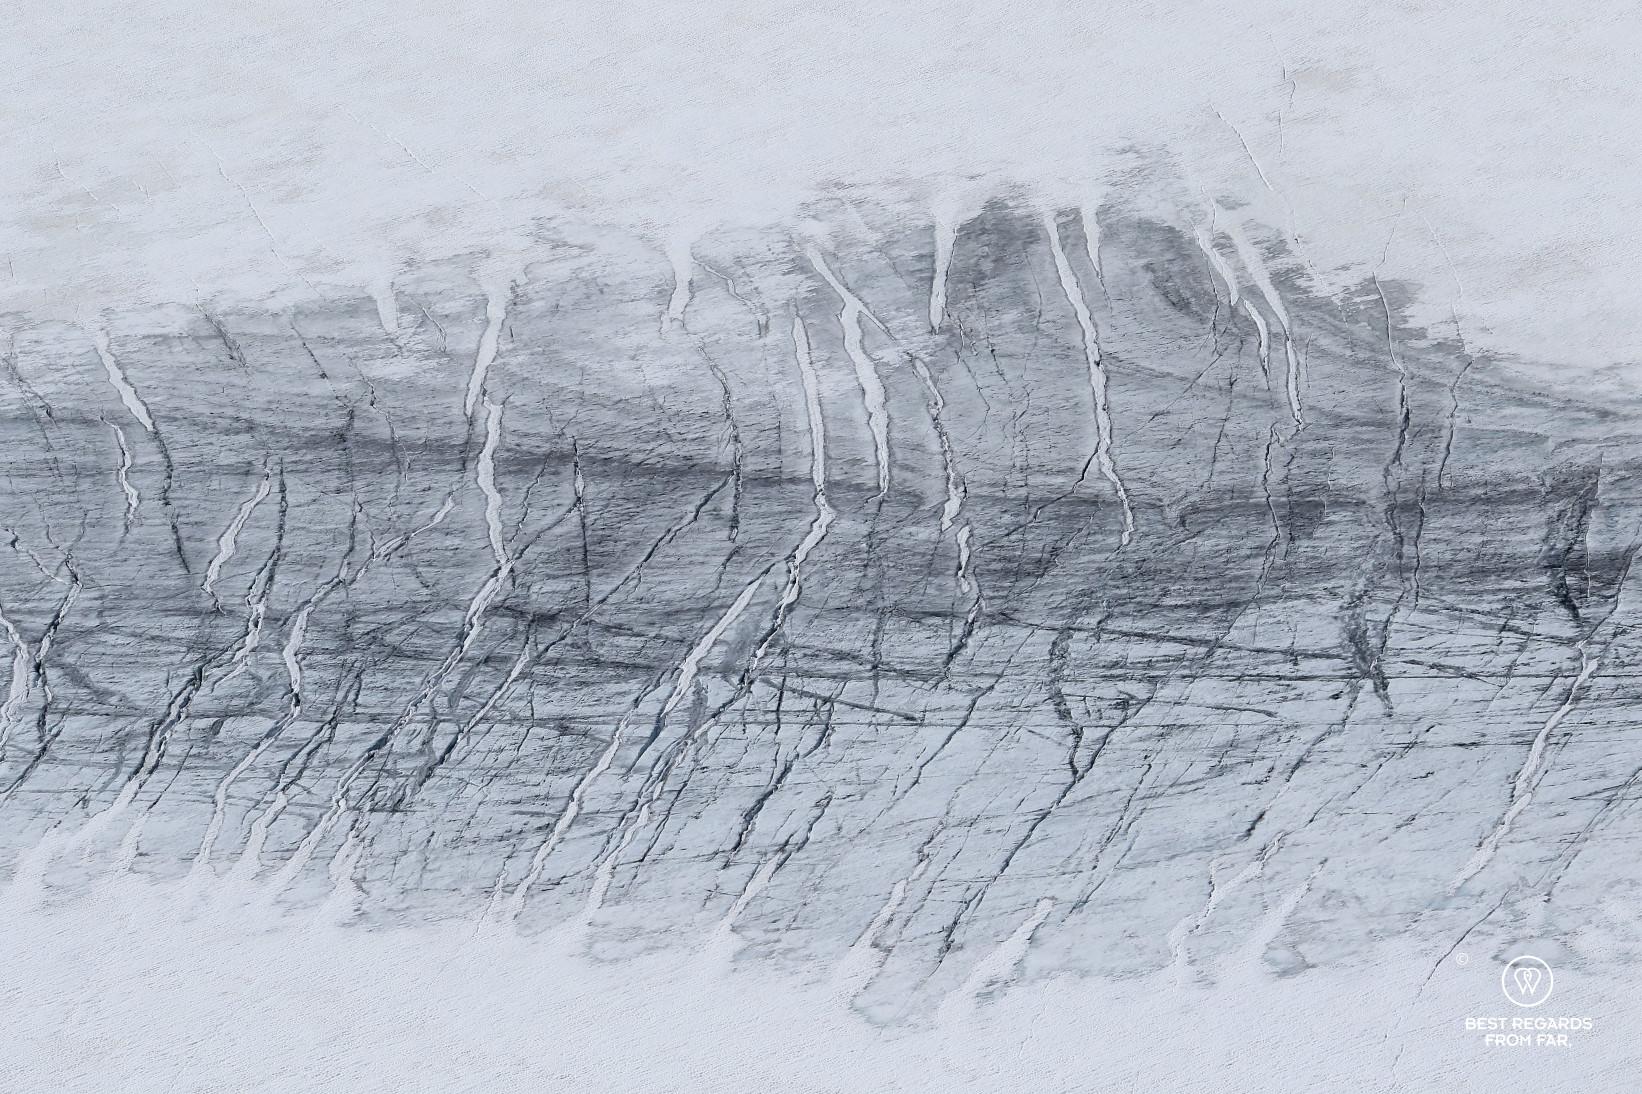 Close-up of the Galdhøpiggen Glacier, Norway